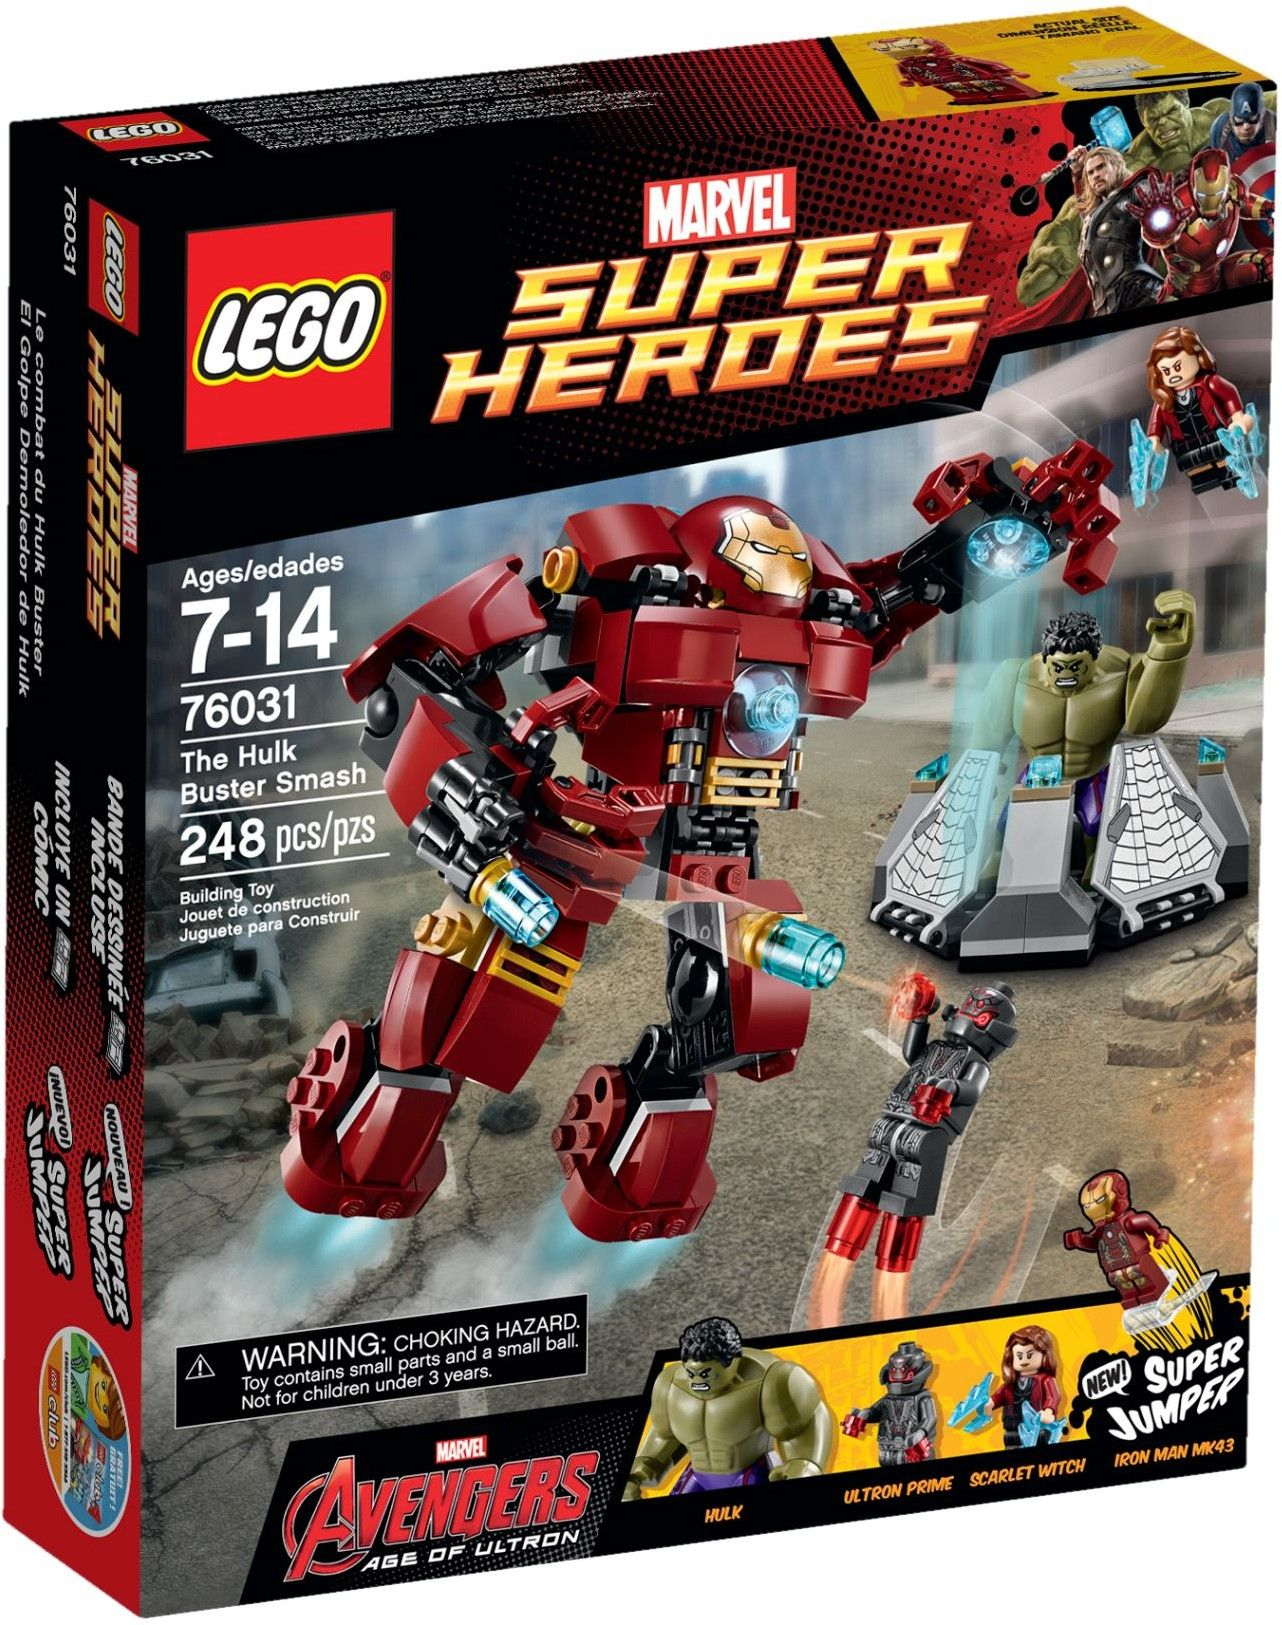 Lego Marvel 76031 The Hulk Buster Smash Lego Marvel Lego Super Heroes Hulkbuster